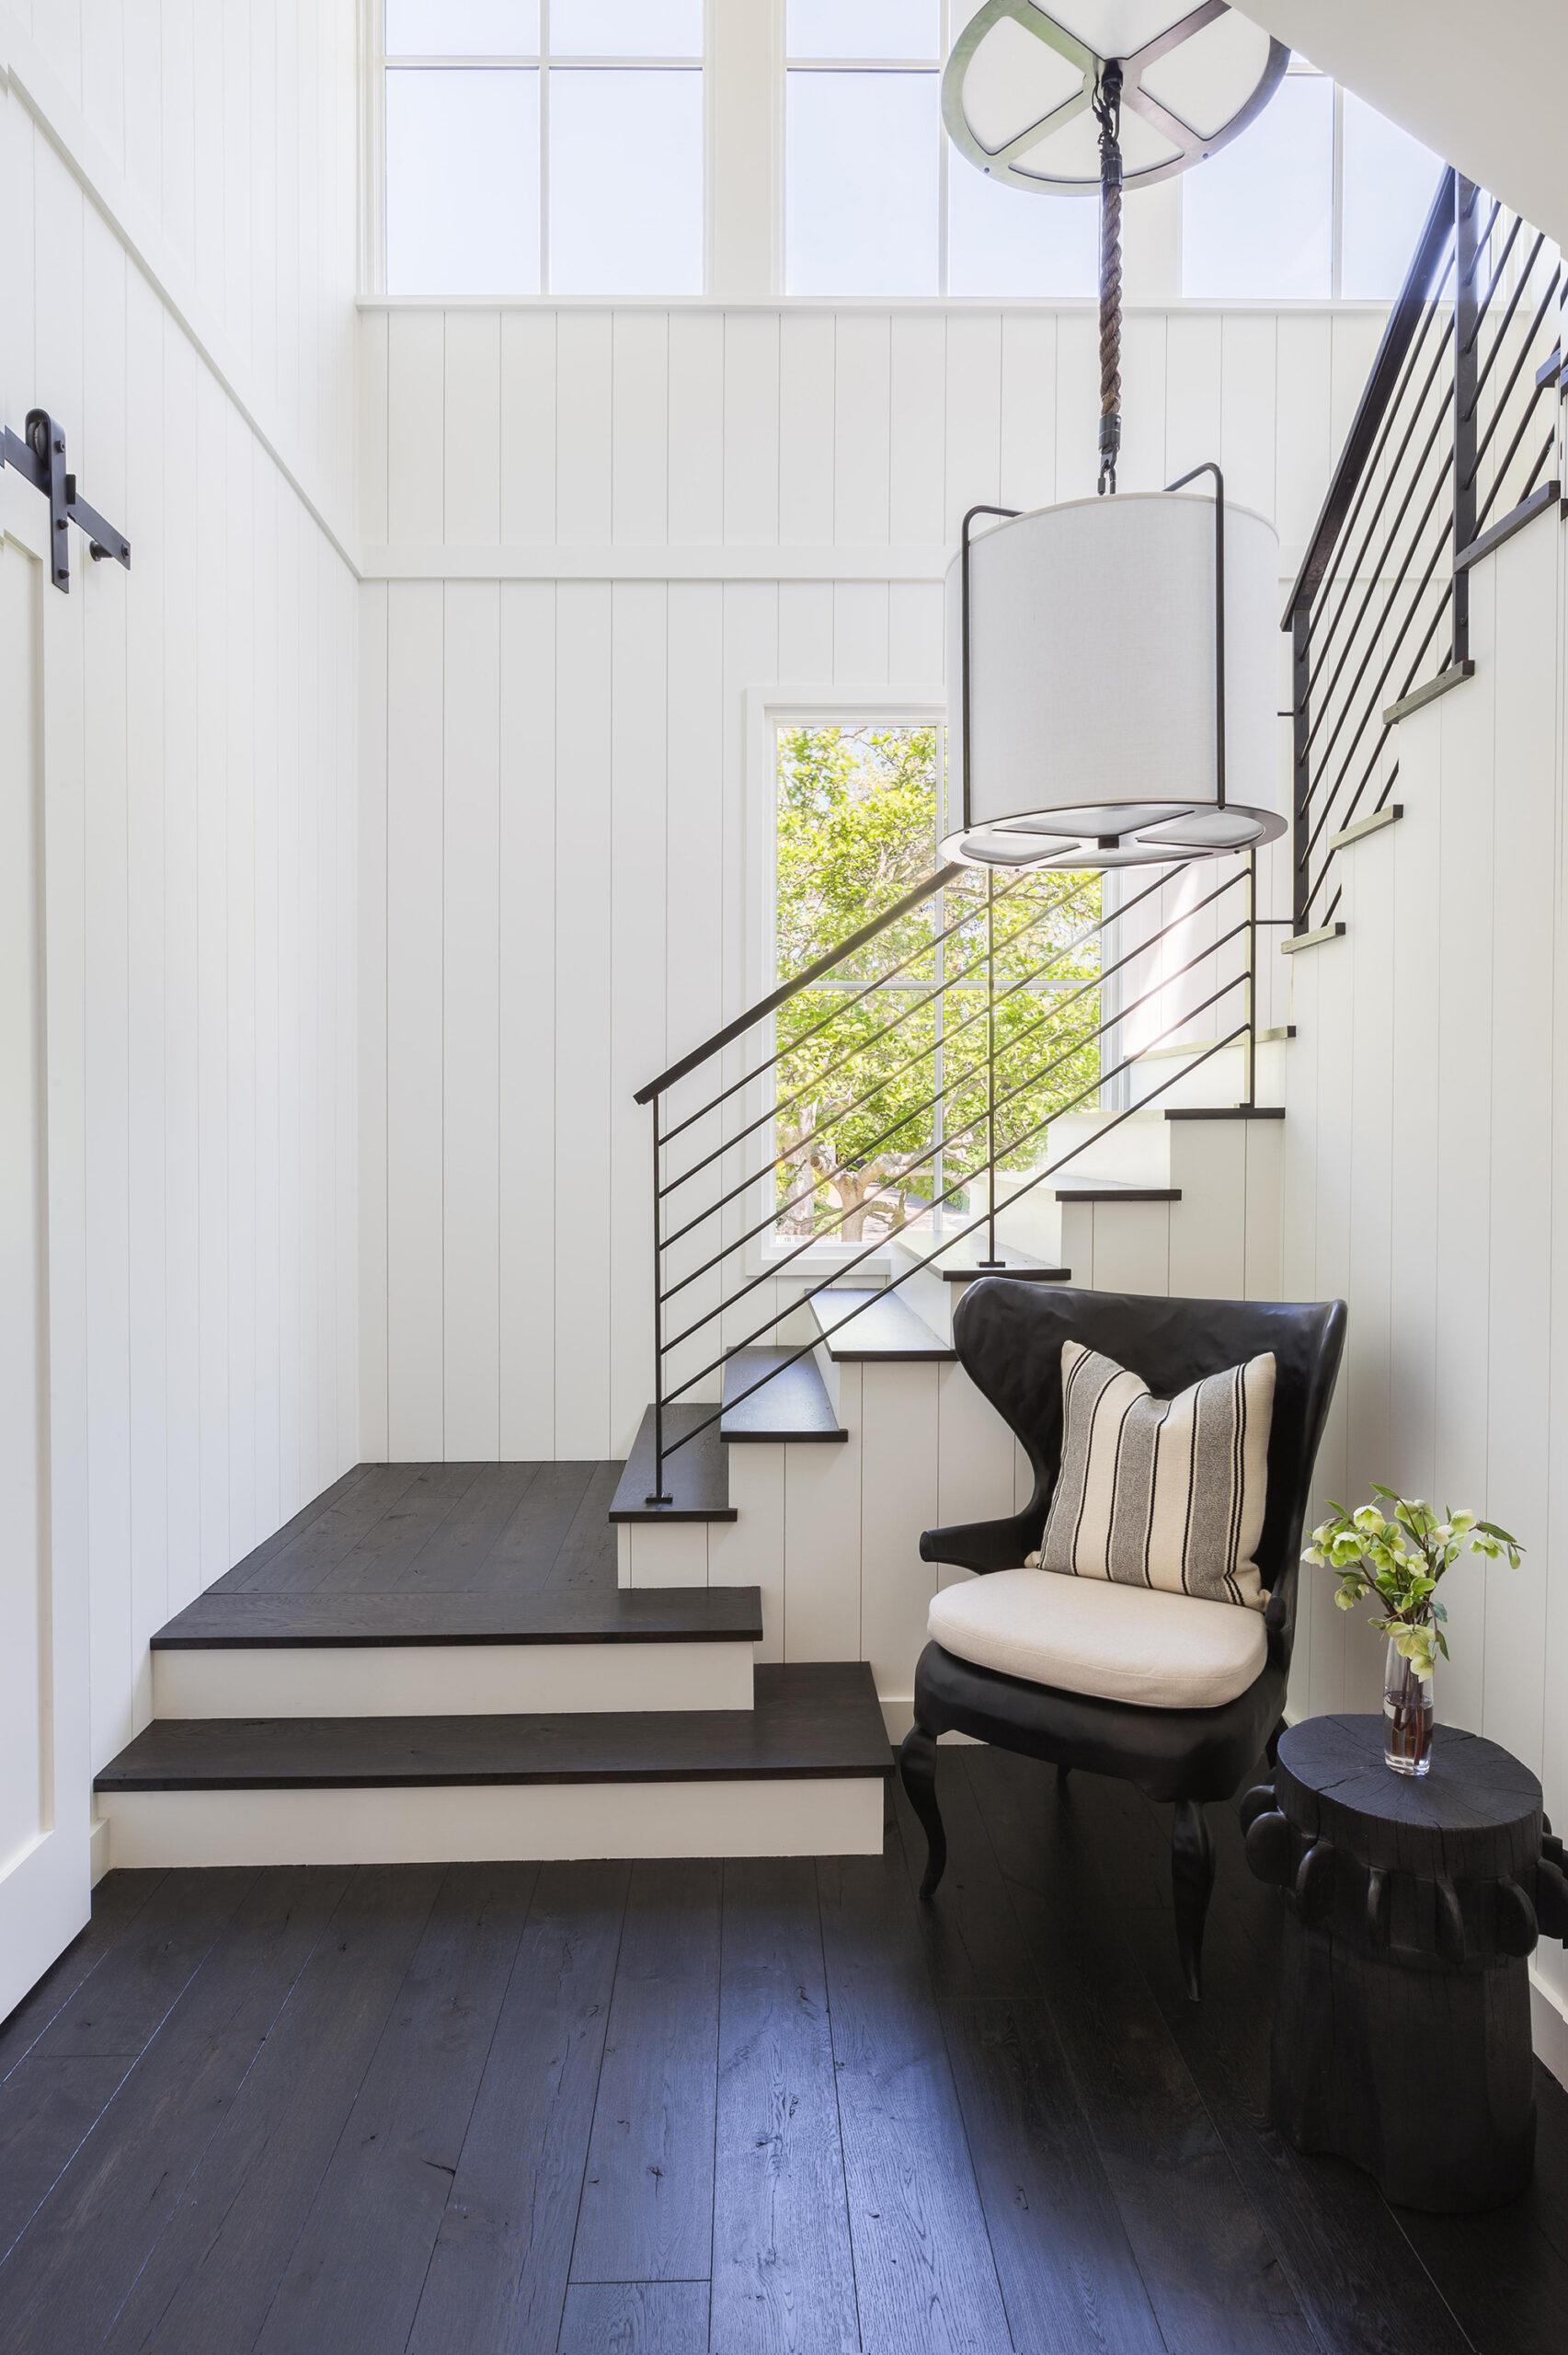 Jennifer Robin stairwell